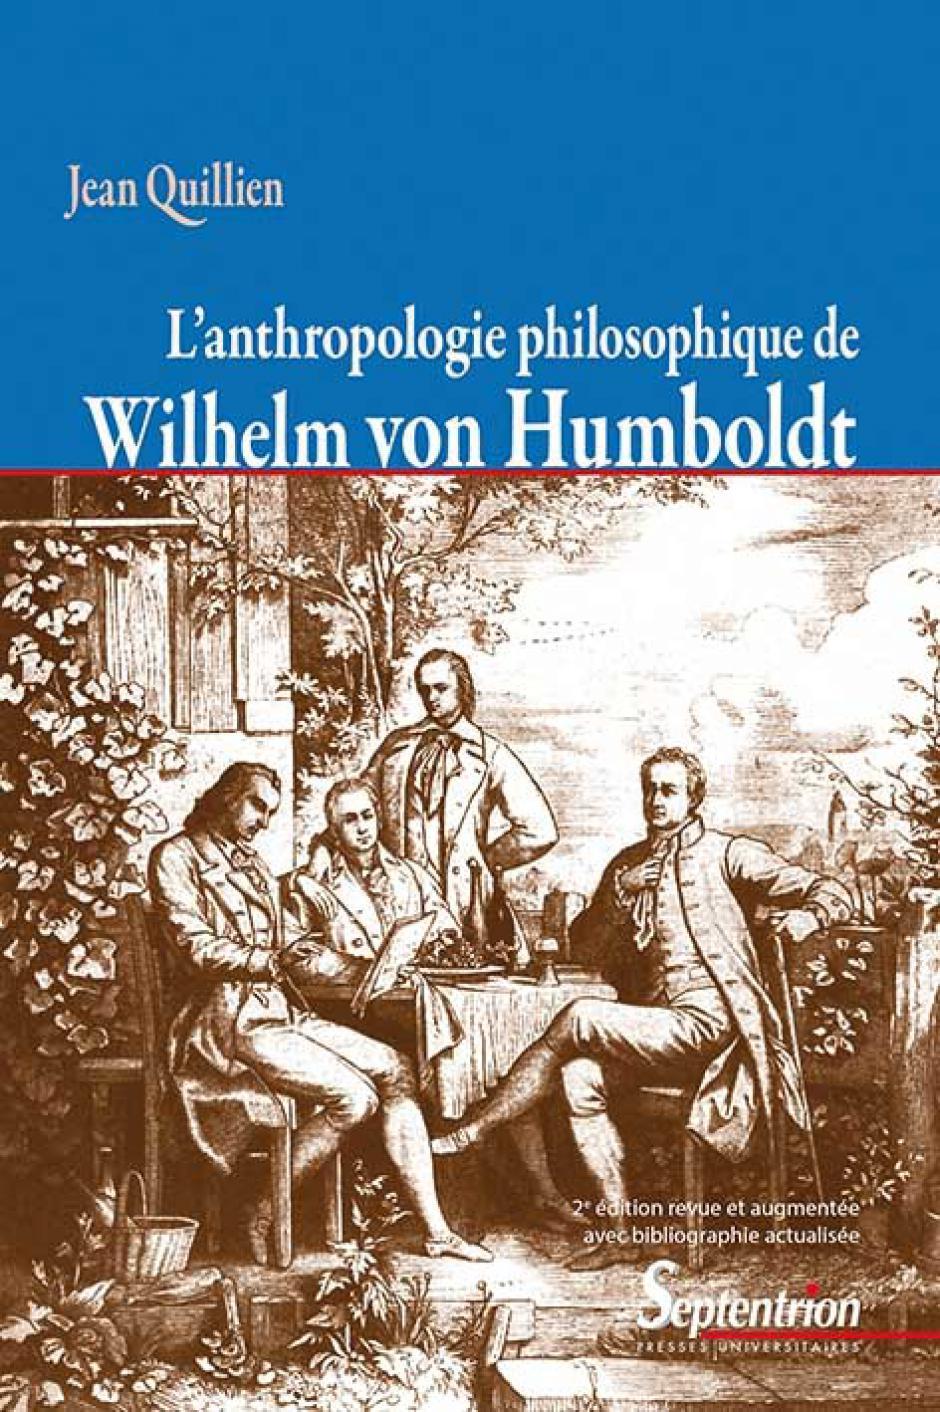 Jean Quillien, L'anthropologie philosophique de Wilhelm von Humboldt